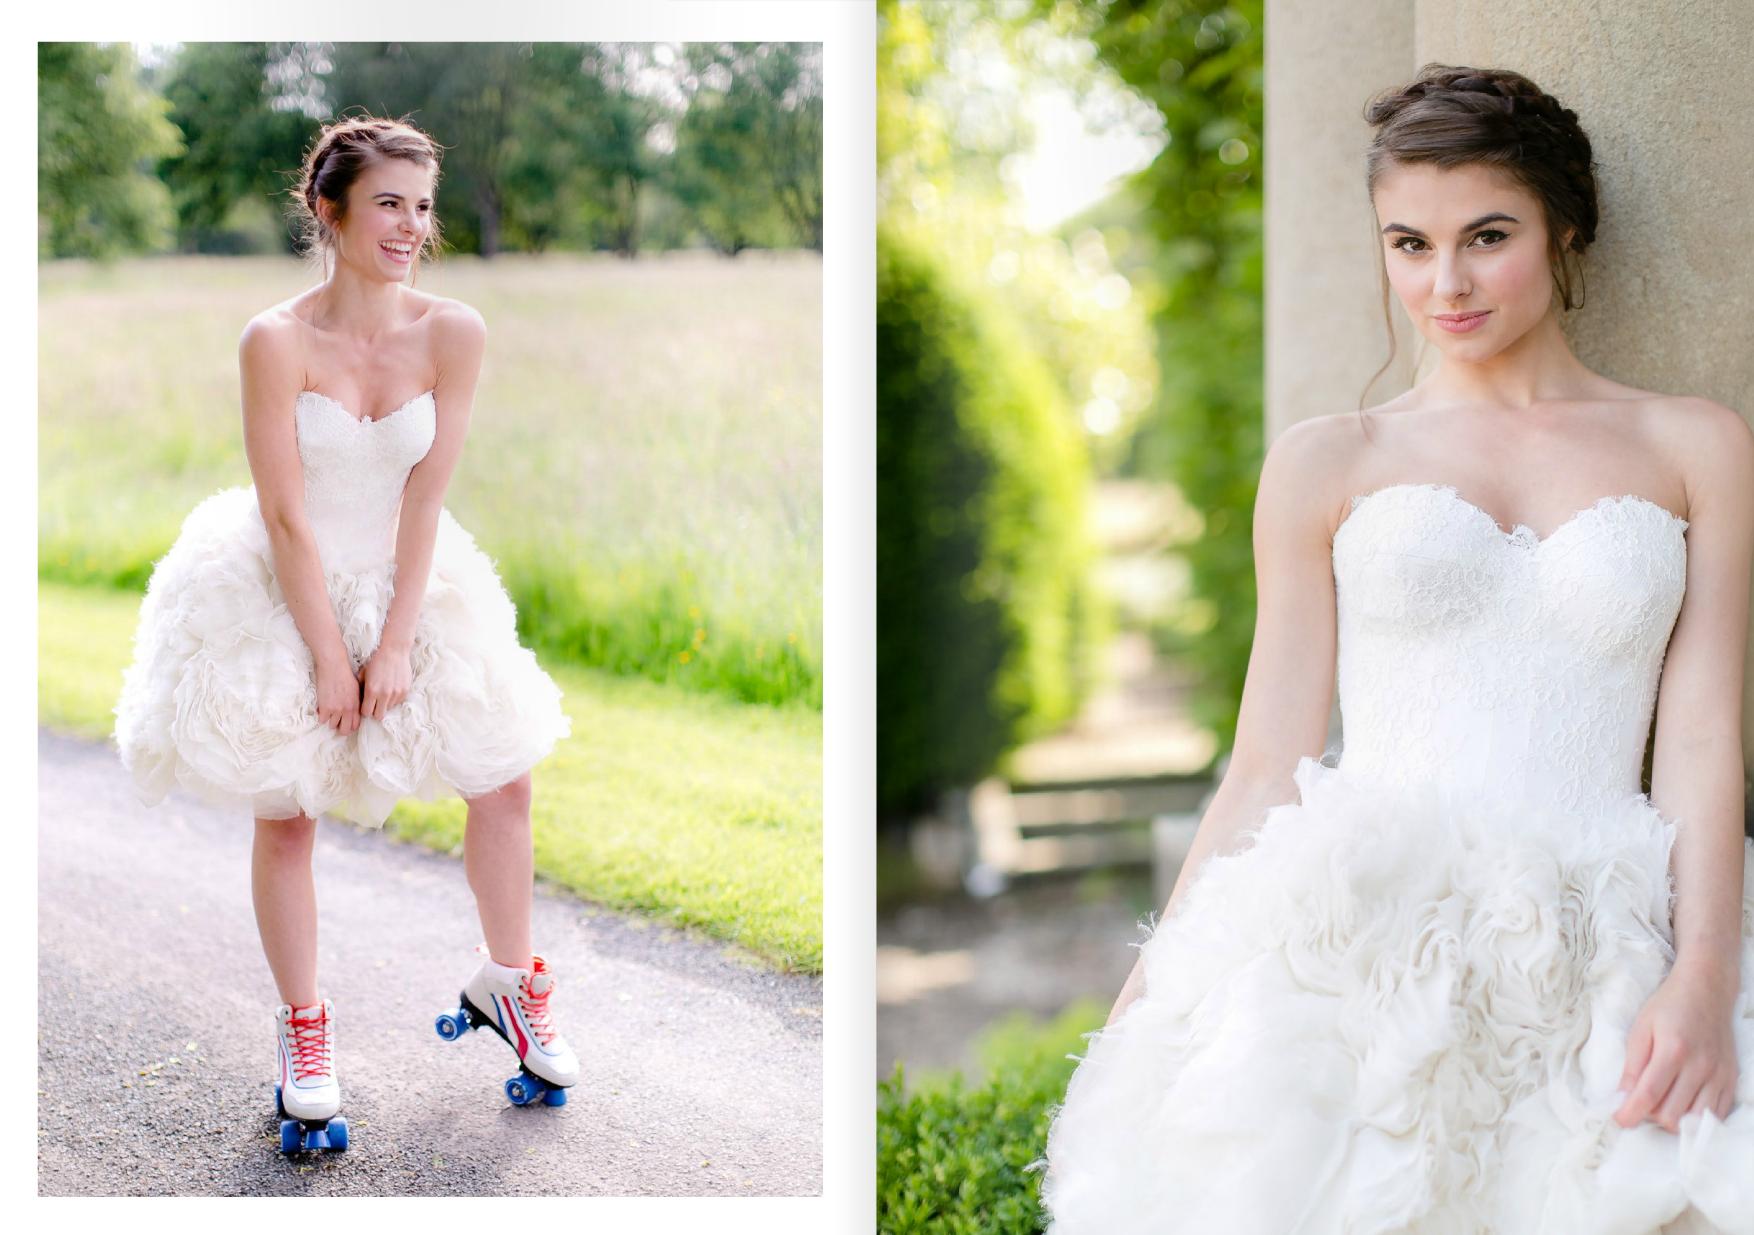 Rock my wedding birdal blog. Novello 2015 shaftsbury. by suzanne neville  xx